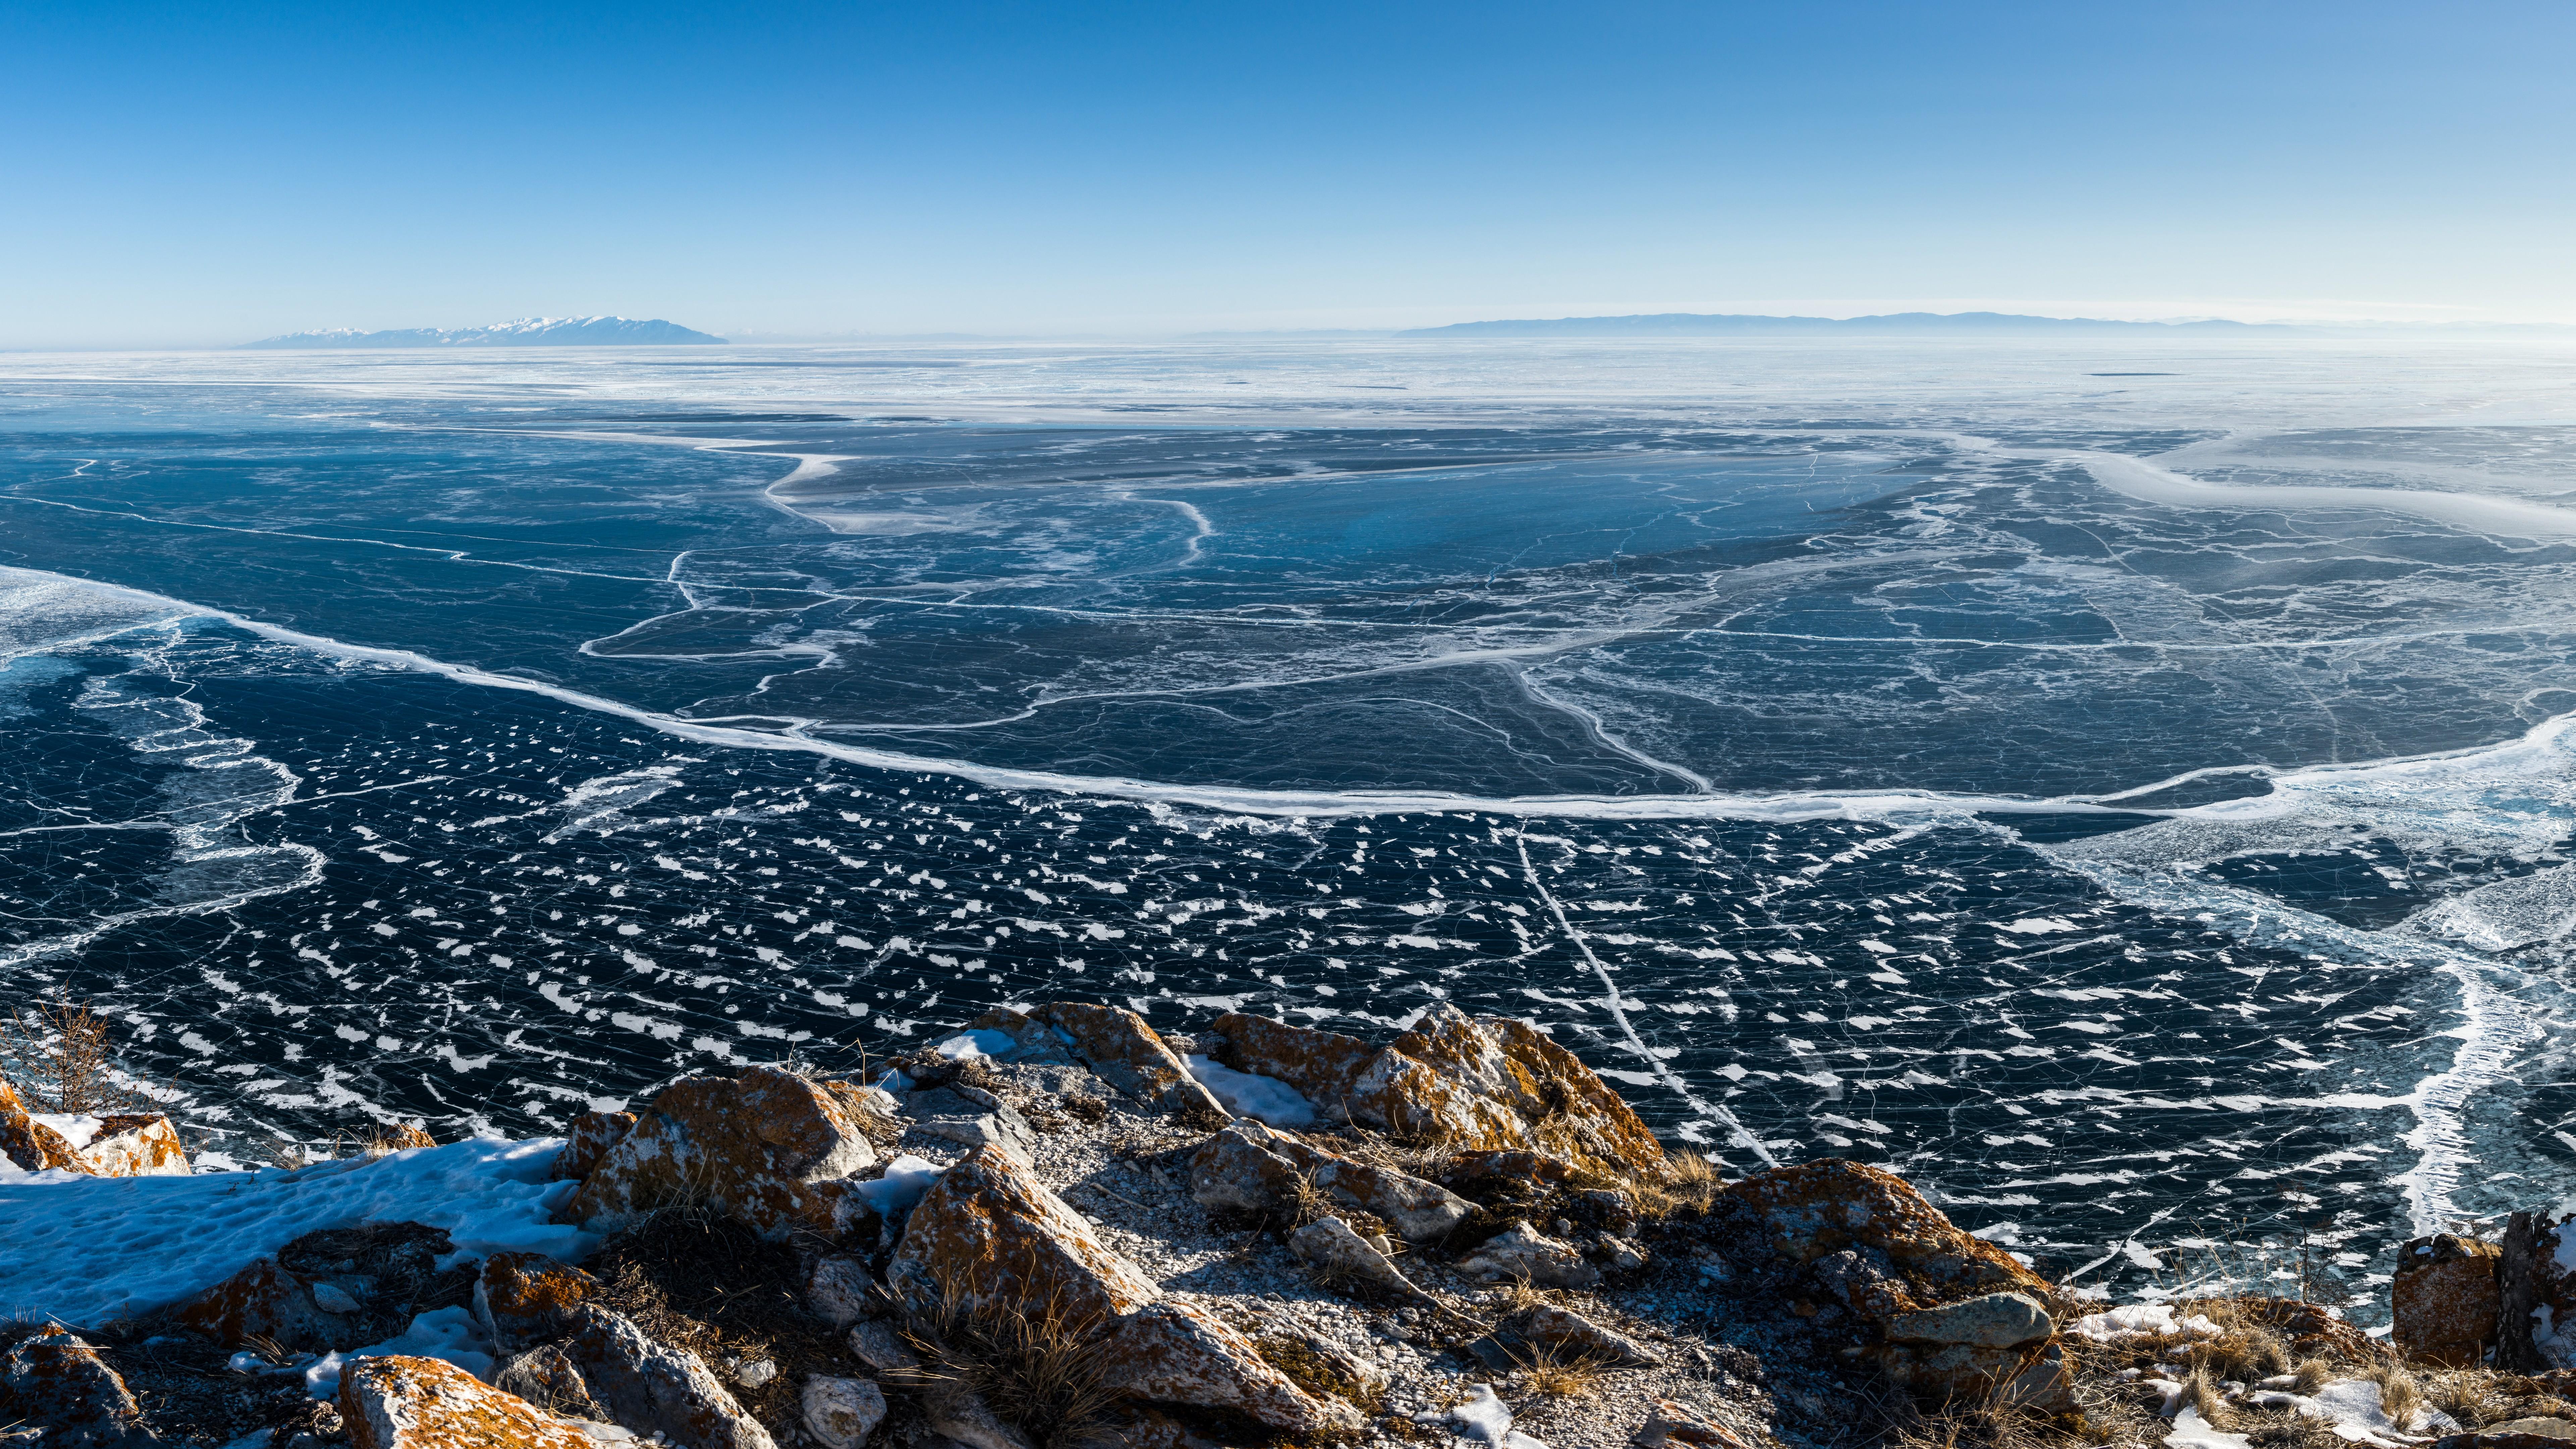 Sci Fi Wallpaper Hd Wallpaper Lake Baikal Ice 8k Nature 15672